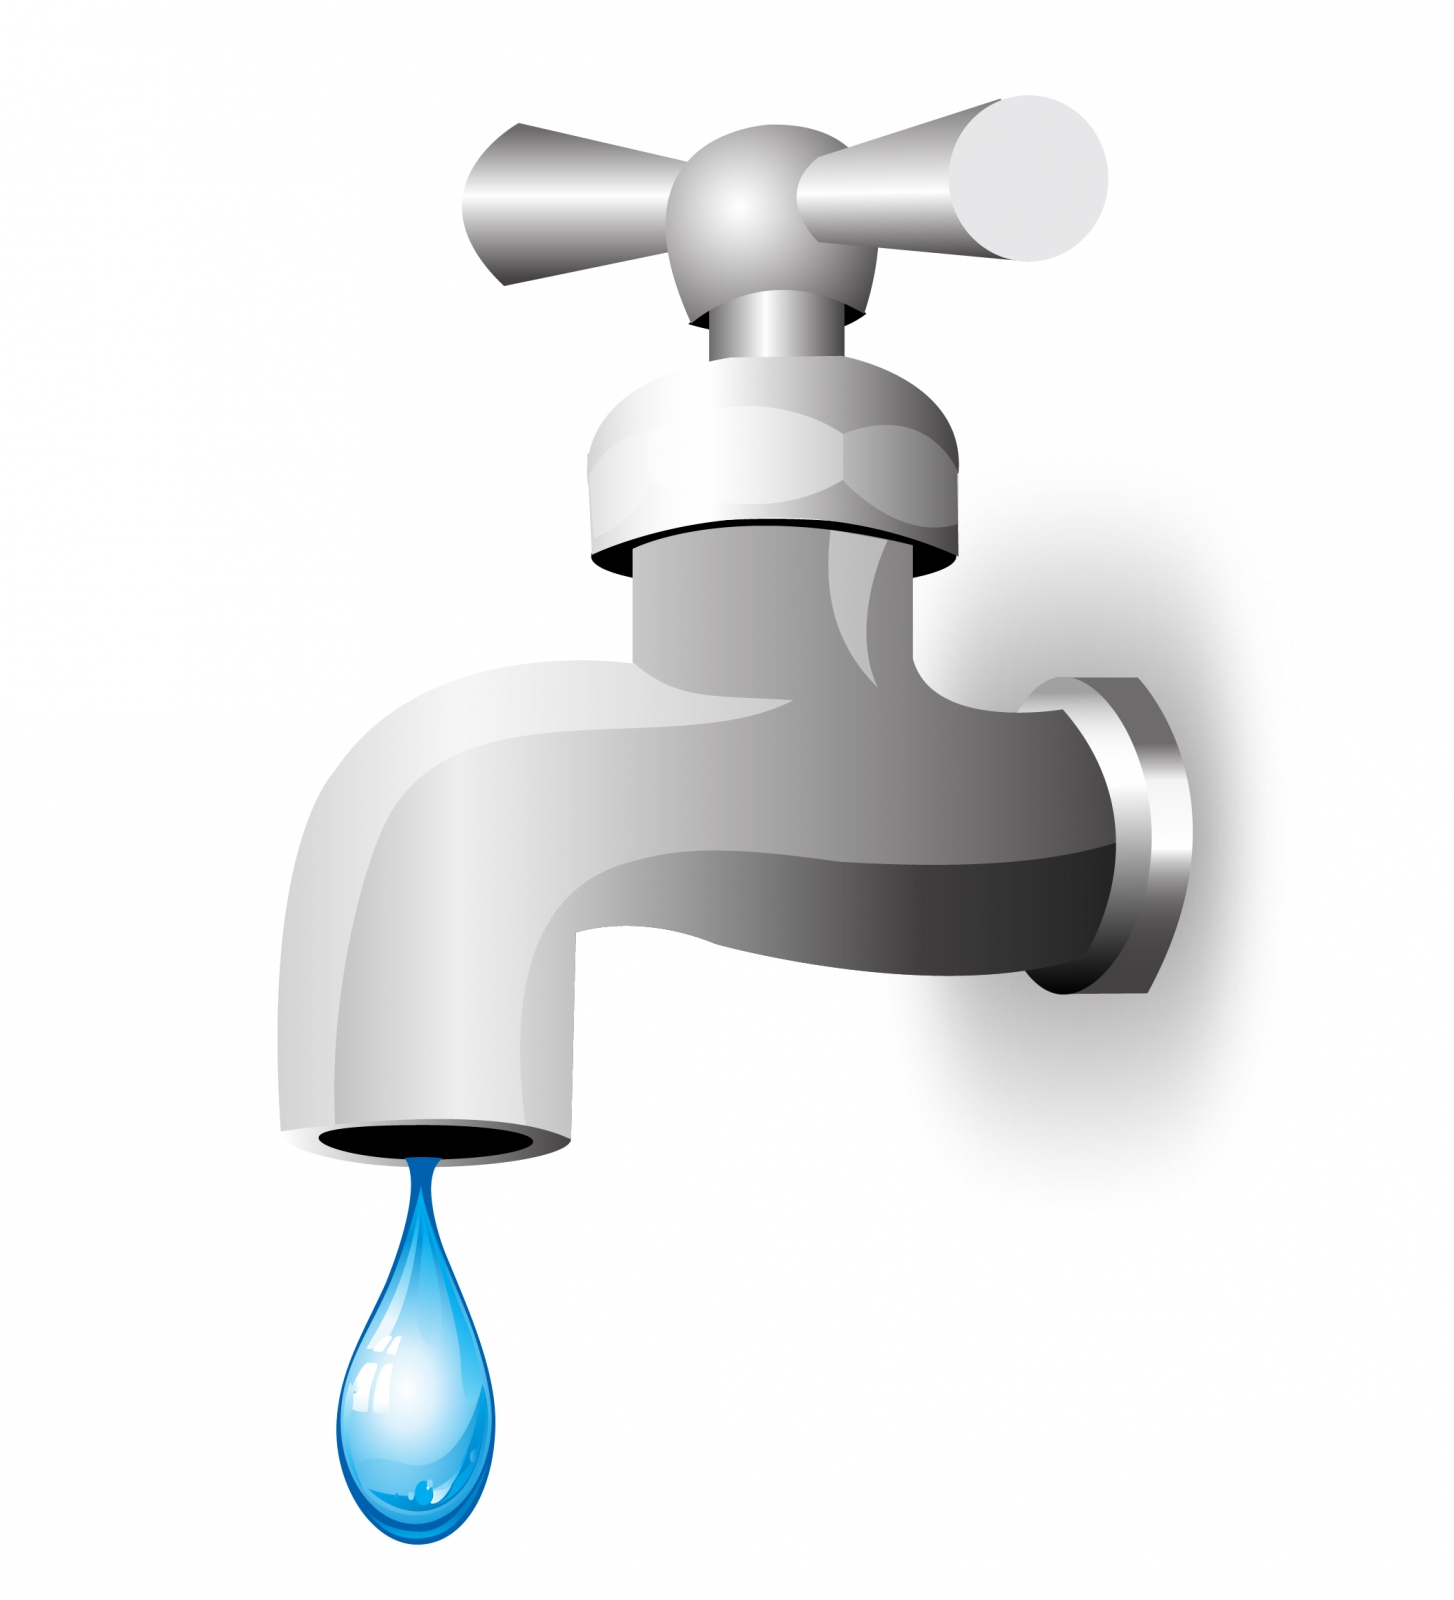 Water Faucet PNG - 151049